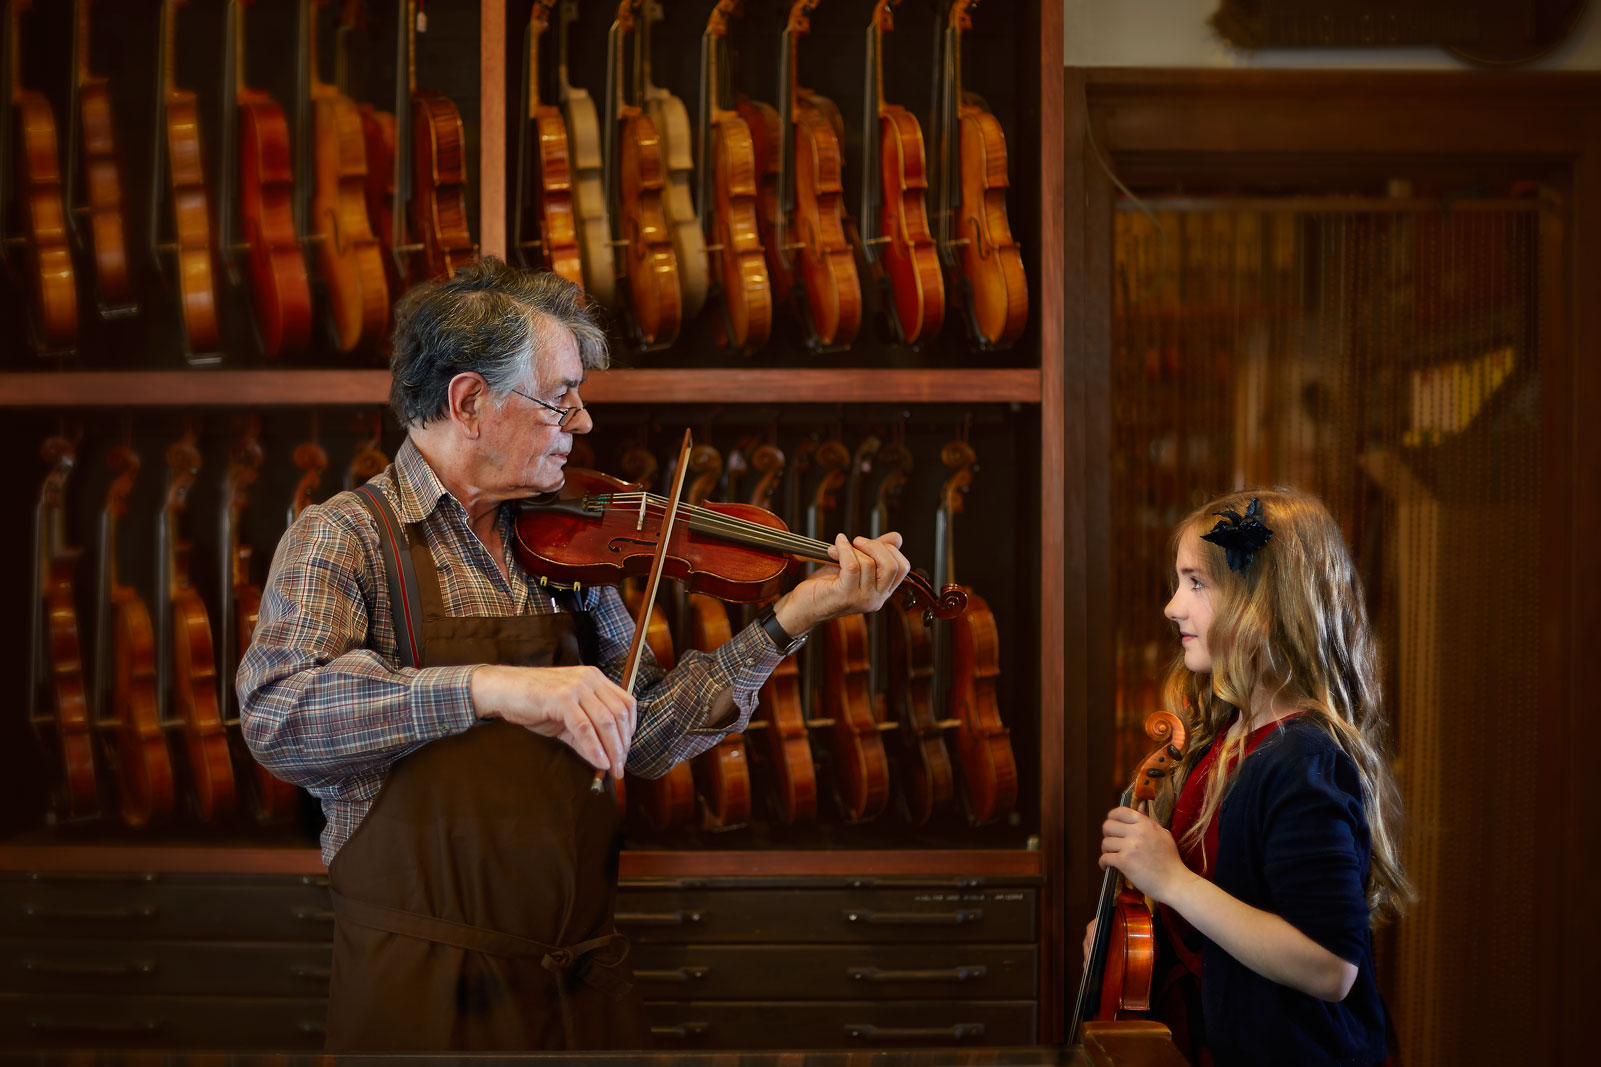 Geige Hand Konstruktion Malen Farbe Geigenbau Geige Violin Musik Instrumentenbau